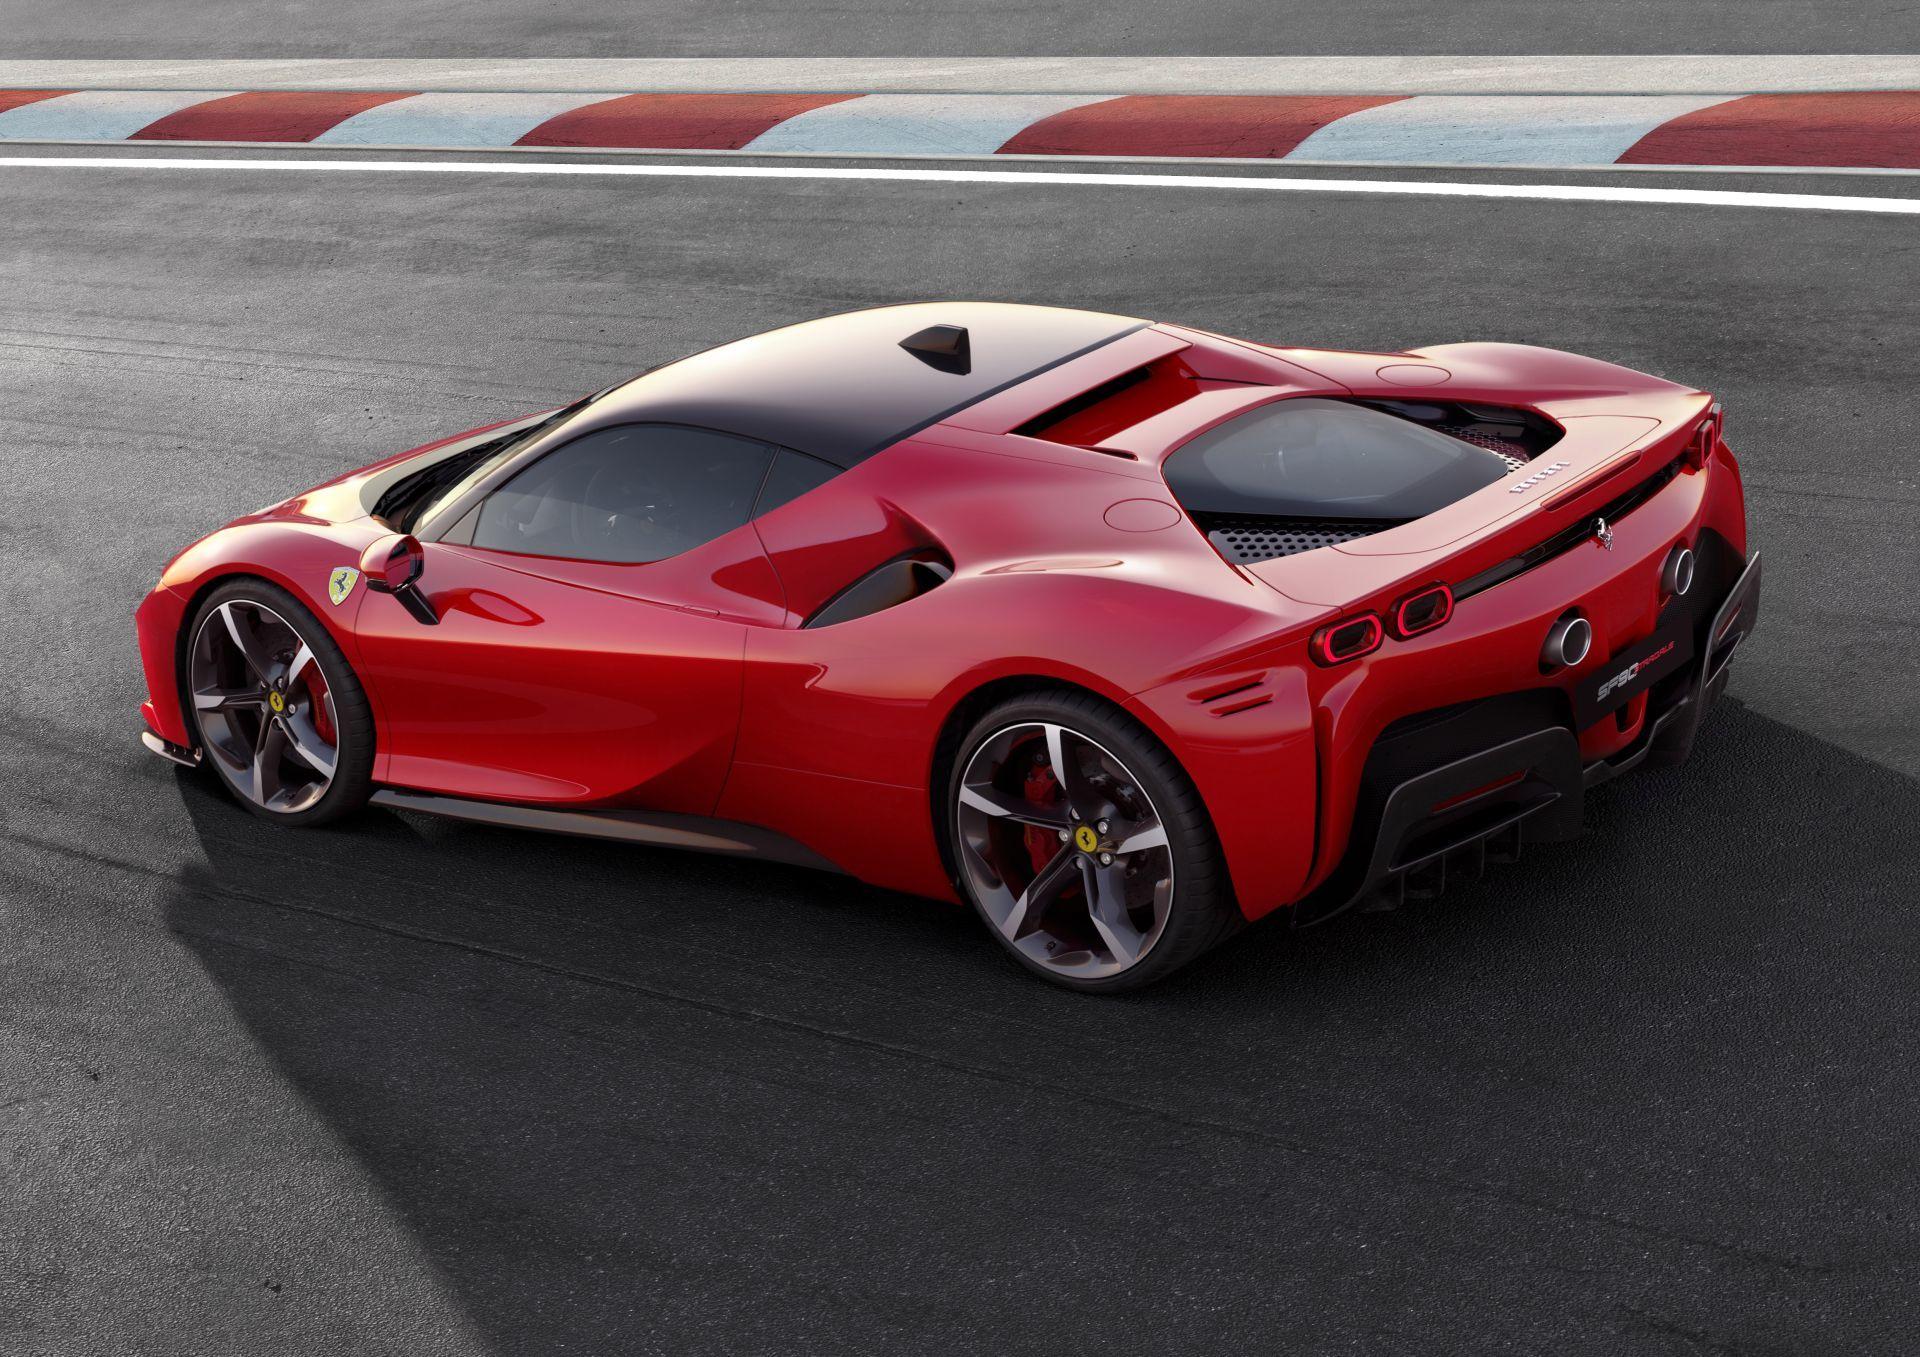 Ferrari Sf90 Stradale 2020 6